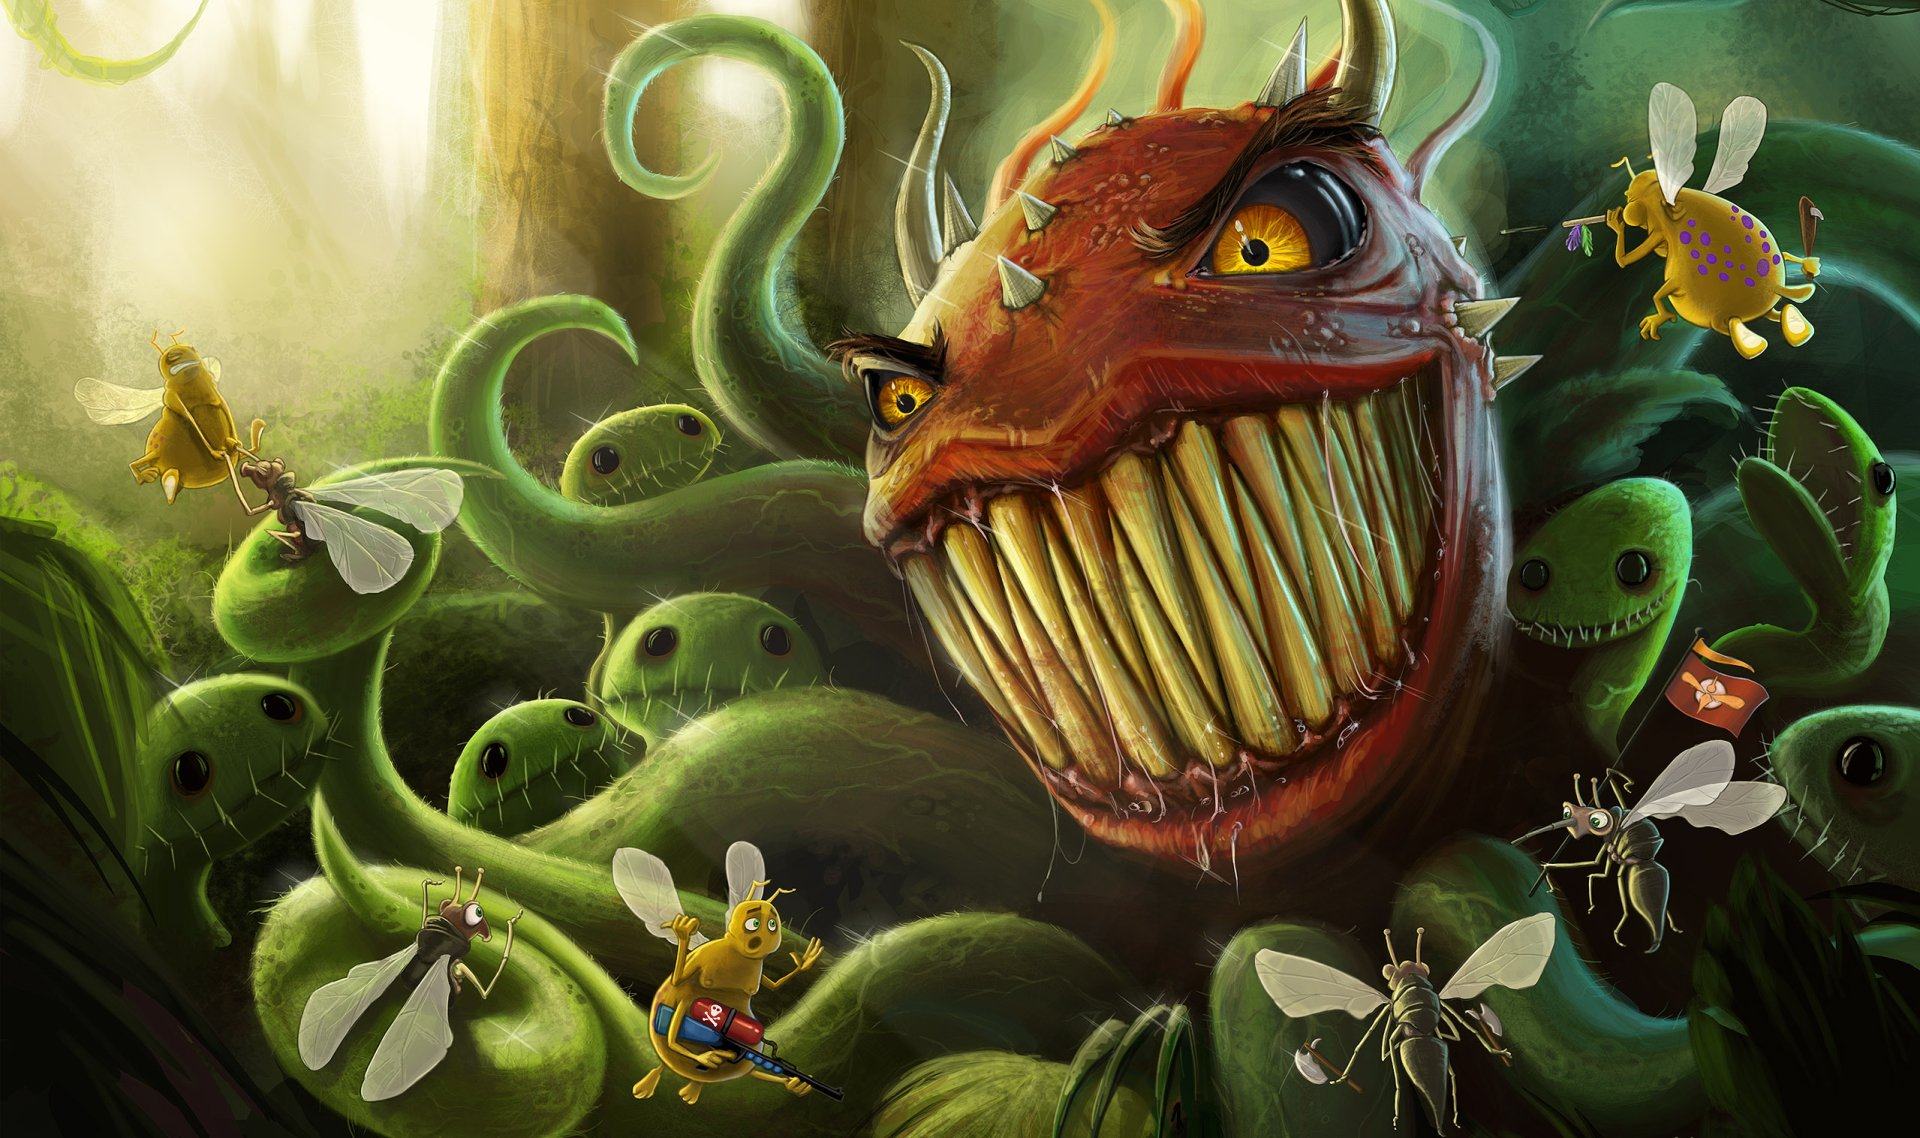 CGI - Fantasy  Bosque Wallpaper